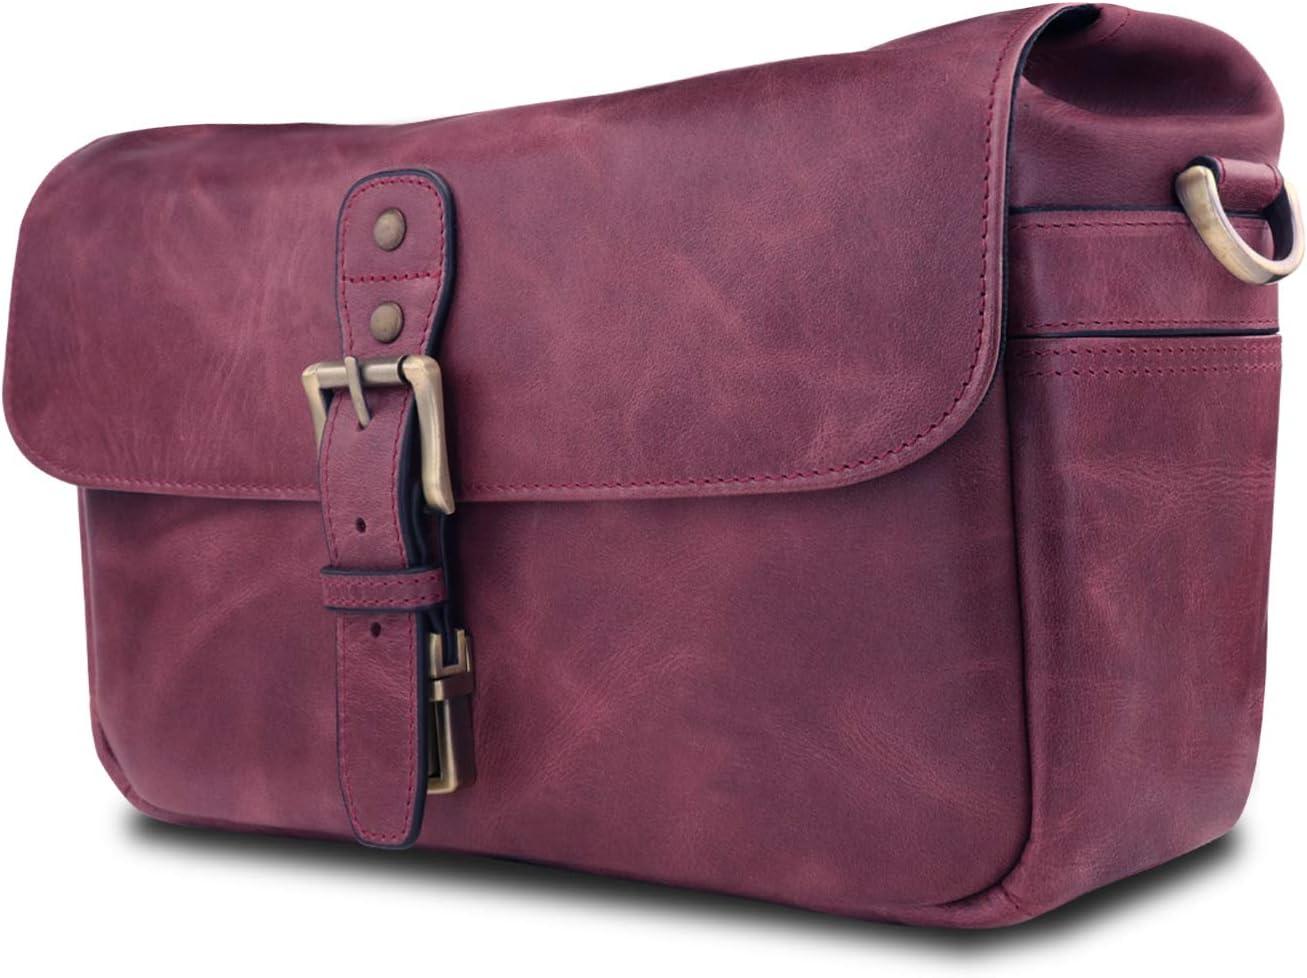 MegaGear Torres Genuine Leather Camera Messenger Bag for Mirrorless Instant and DSLR Cameras